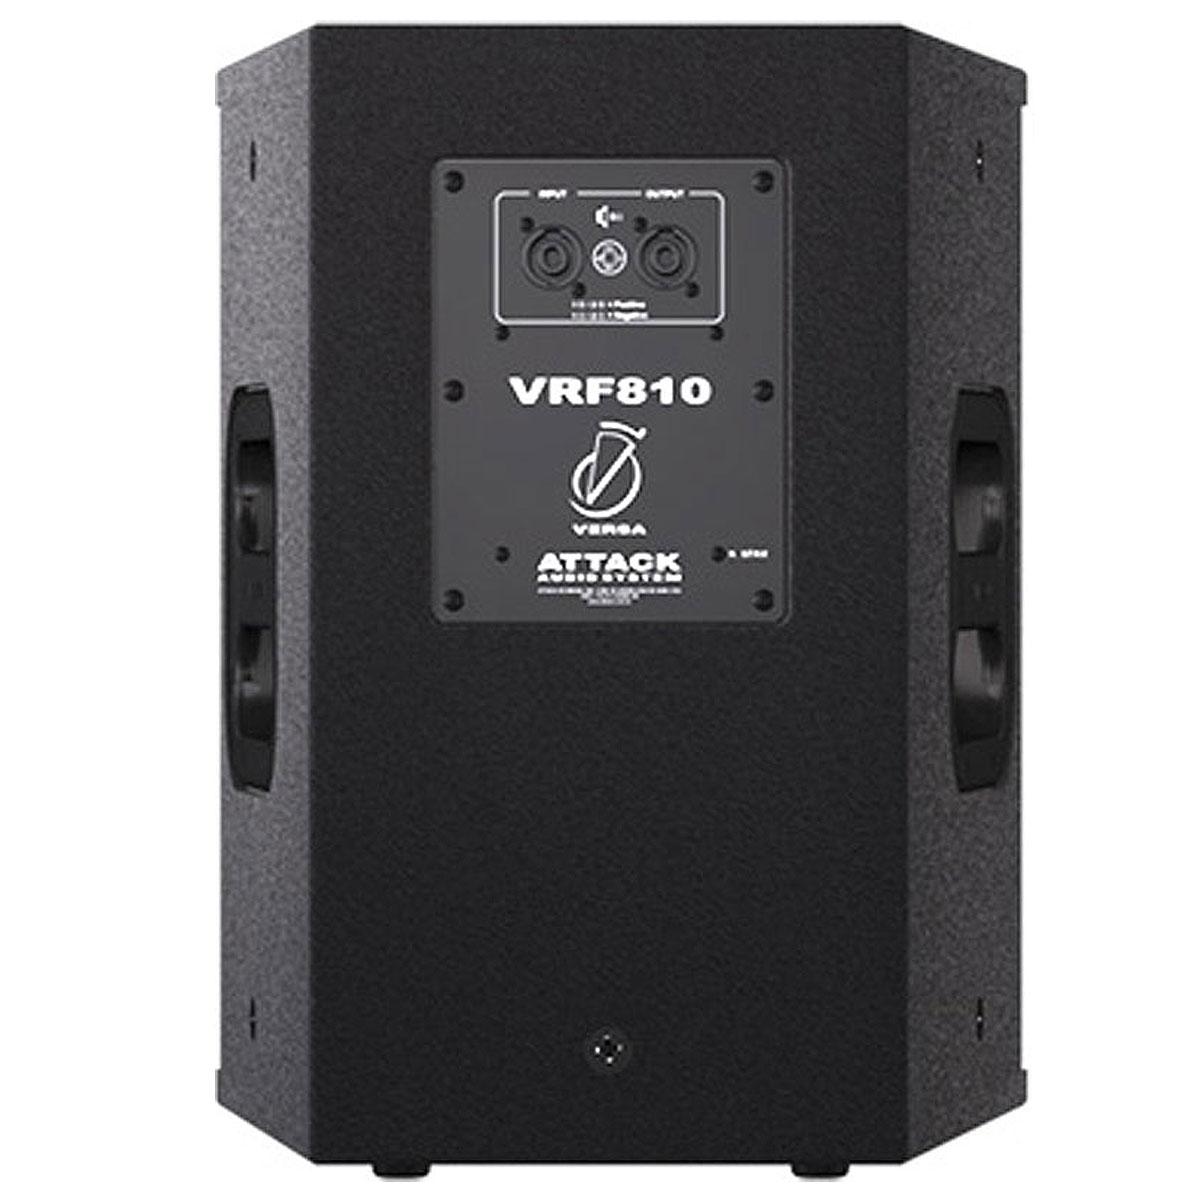 VRF810 - Caixa Passiva 100W VRF 810 - Attack